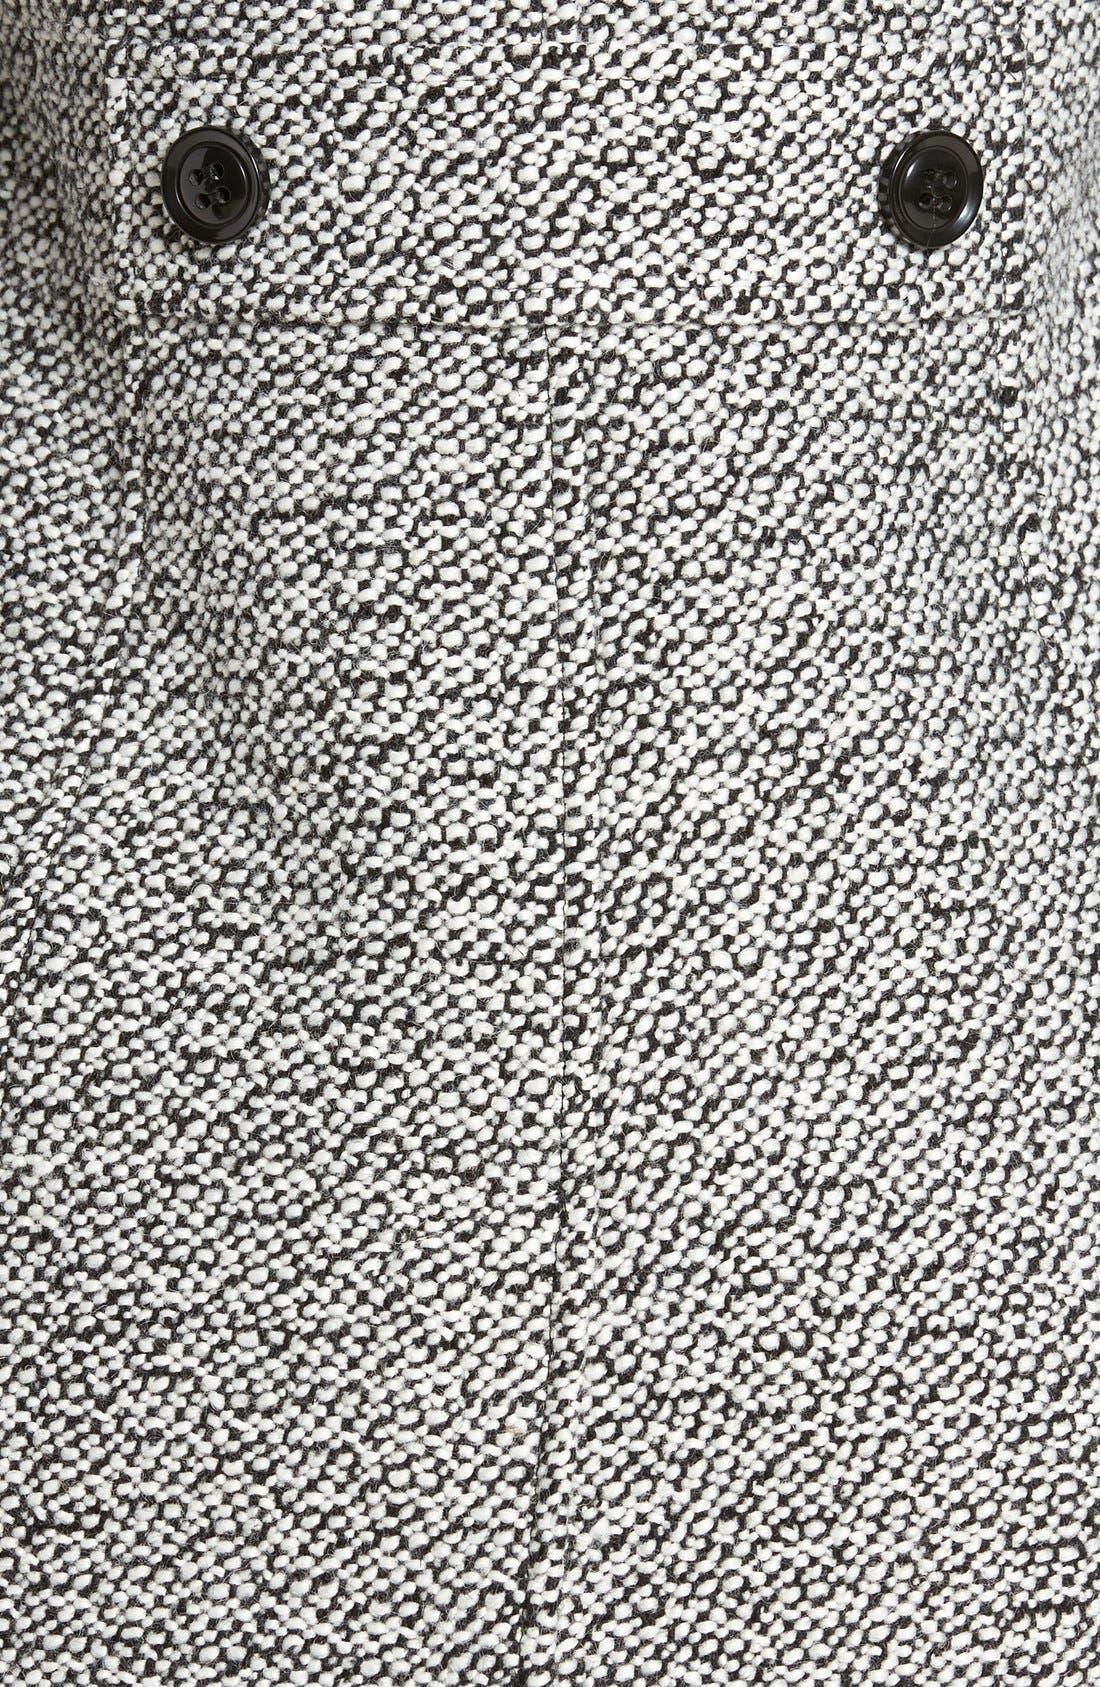 Notch Collar Tweed Coat,                             Alternate thumbnail 5, color,                             White/ Black